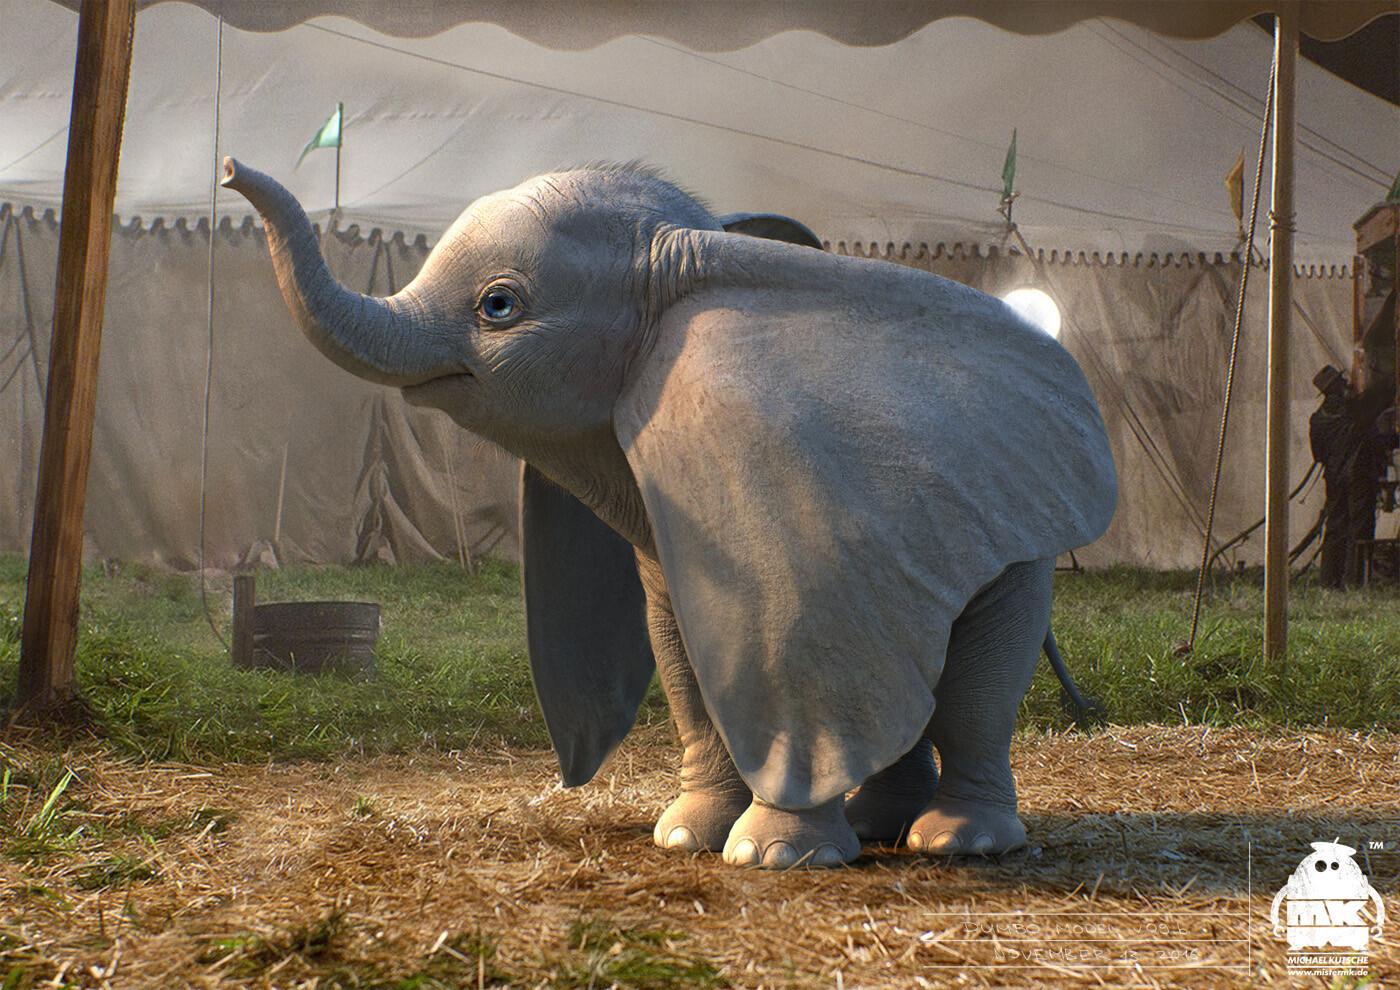 Dumbo [Disney - 2019] - Page 14 Michael-kutsche-dumbo-design-by-michael-kutsche